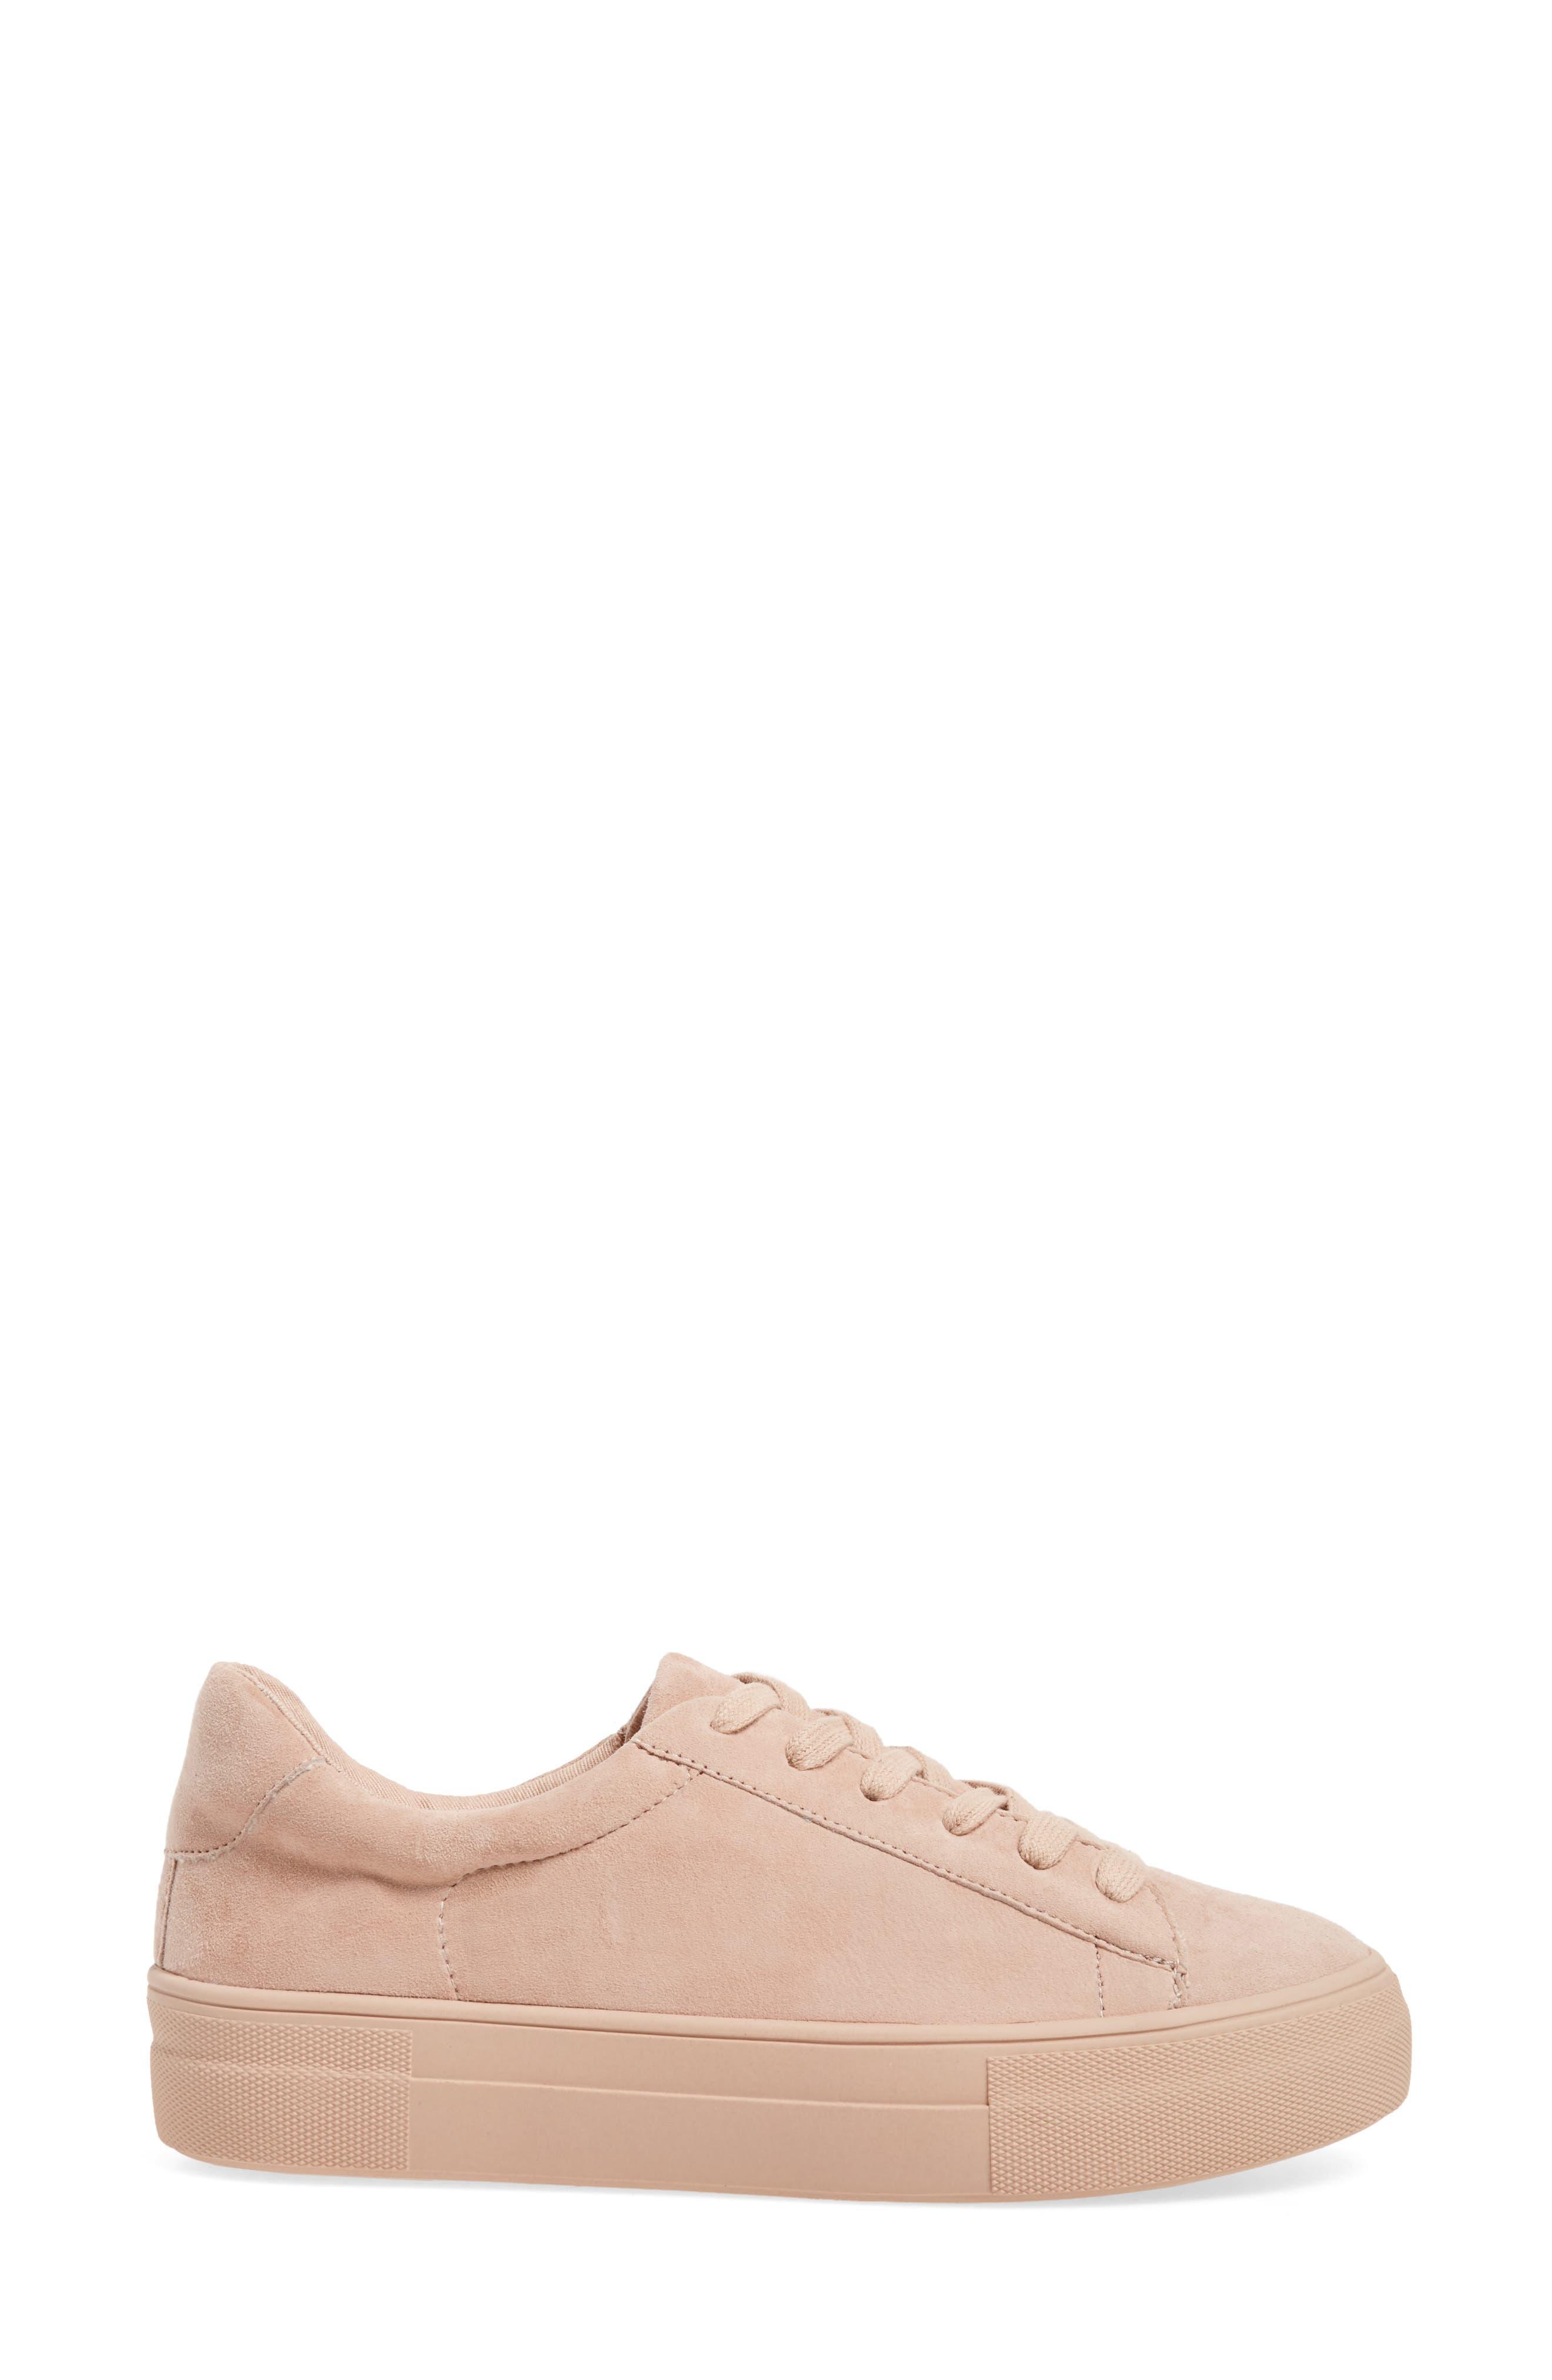 Gisela Low Top Sneaker,                             Alternate thumbnail 9, color,